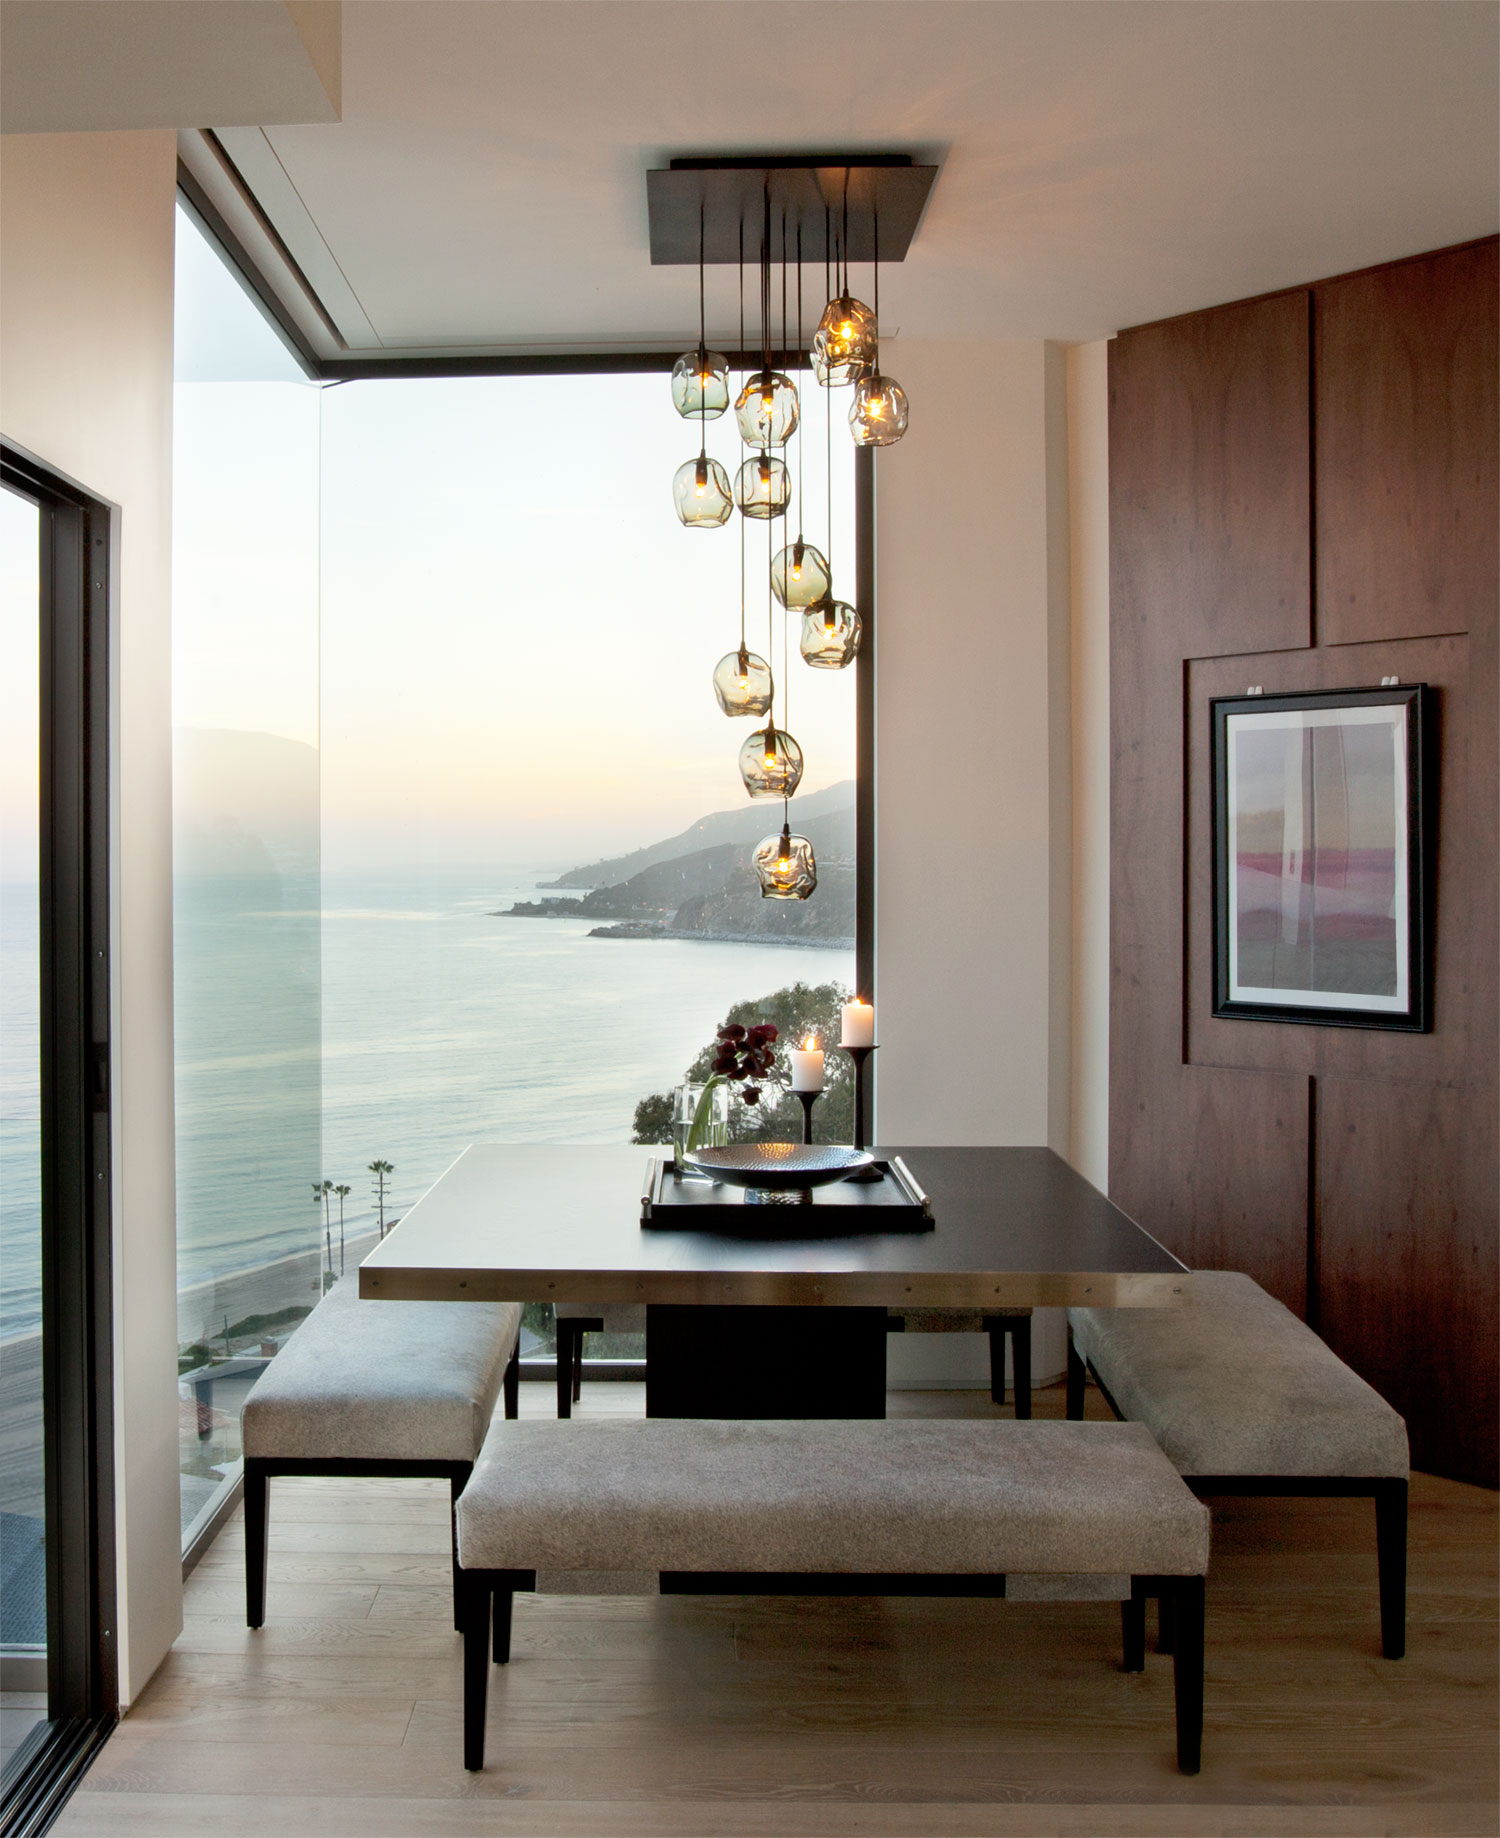 modern-architecture-residential-remodel-interior-inspirational-view-shubindonaldson-revello-residence-1